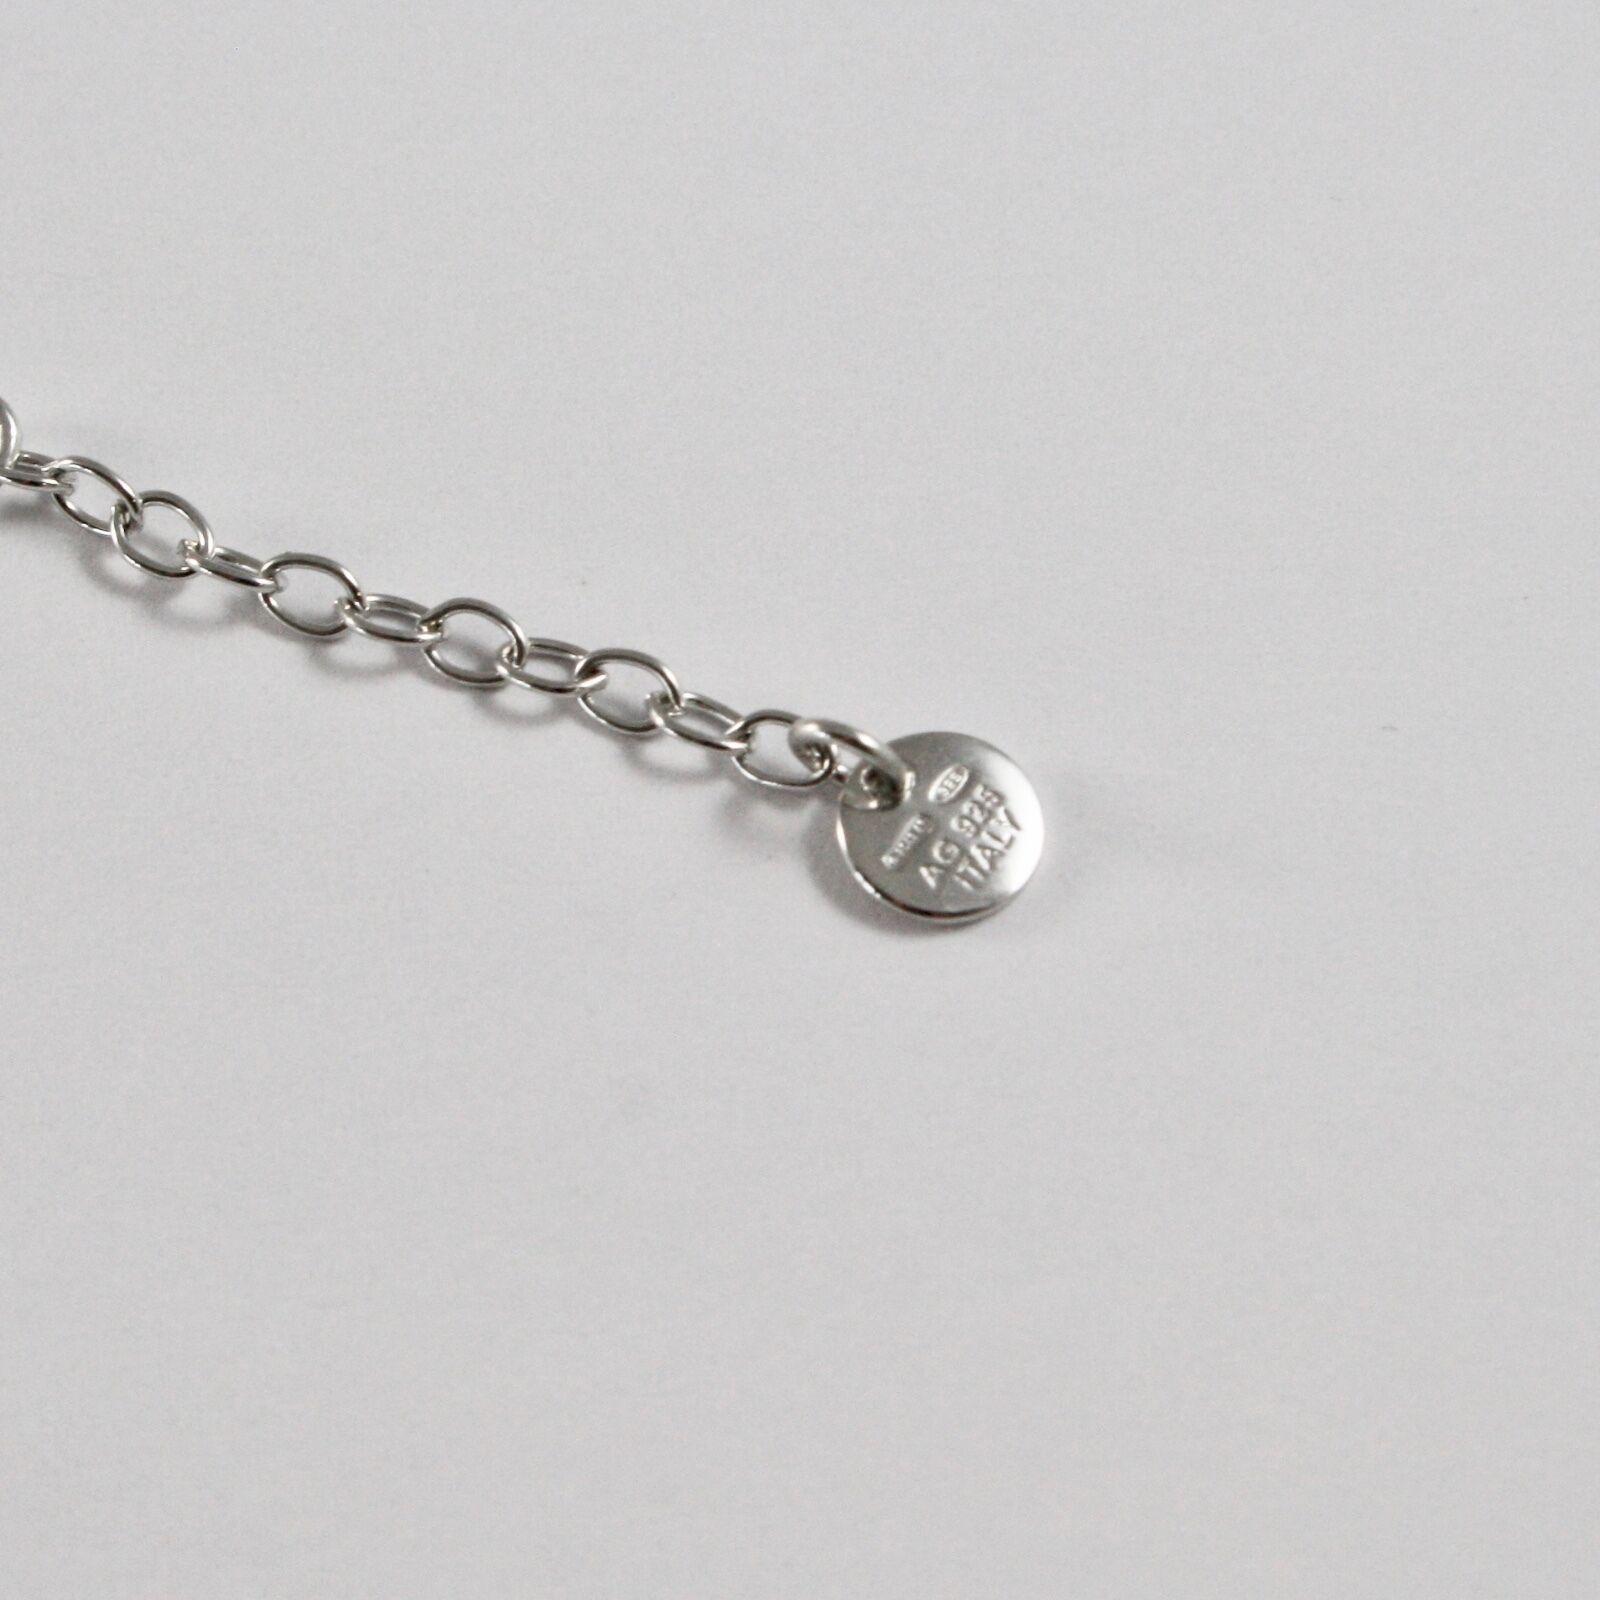 Silber Armband 925 Jack&co mit Schmetterling Stilisiert Zirkonia Cubic JCB0886 image 5